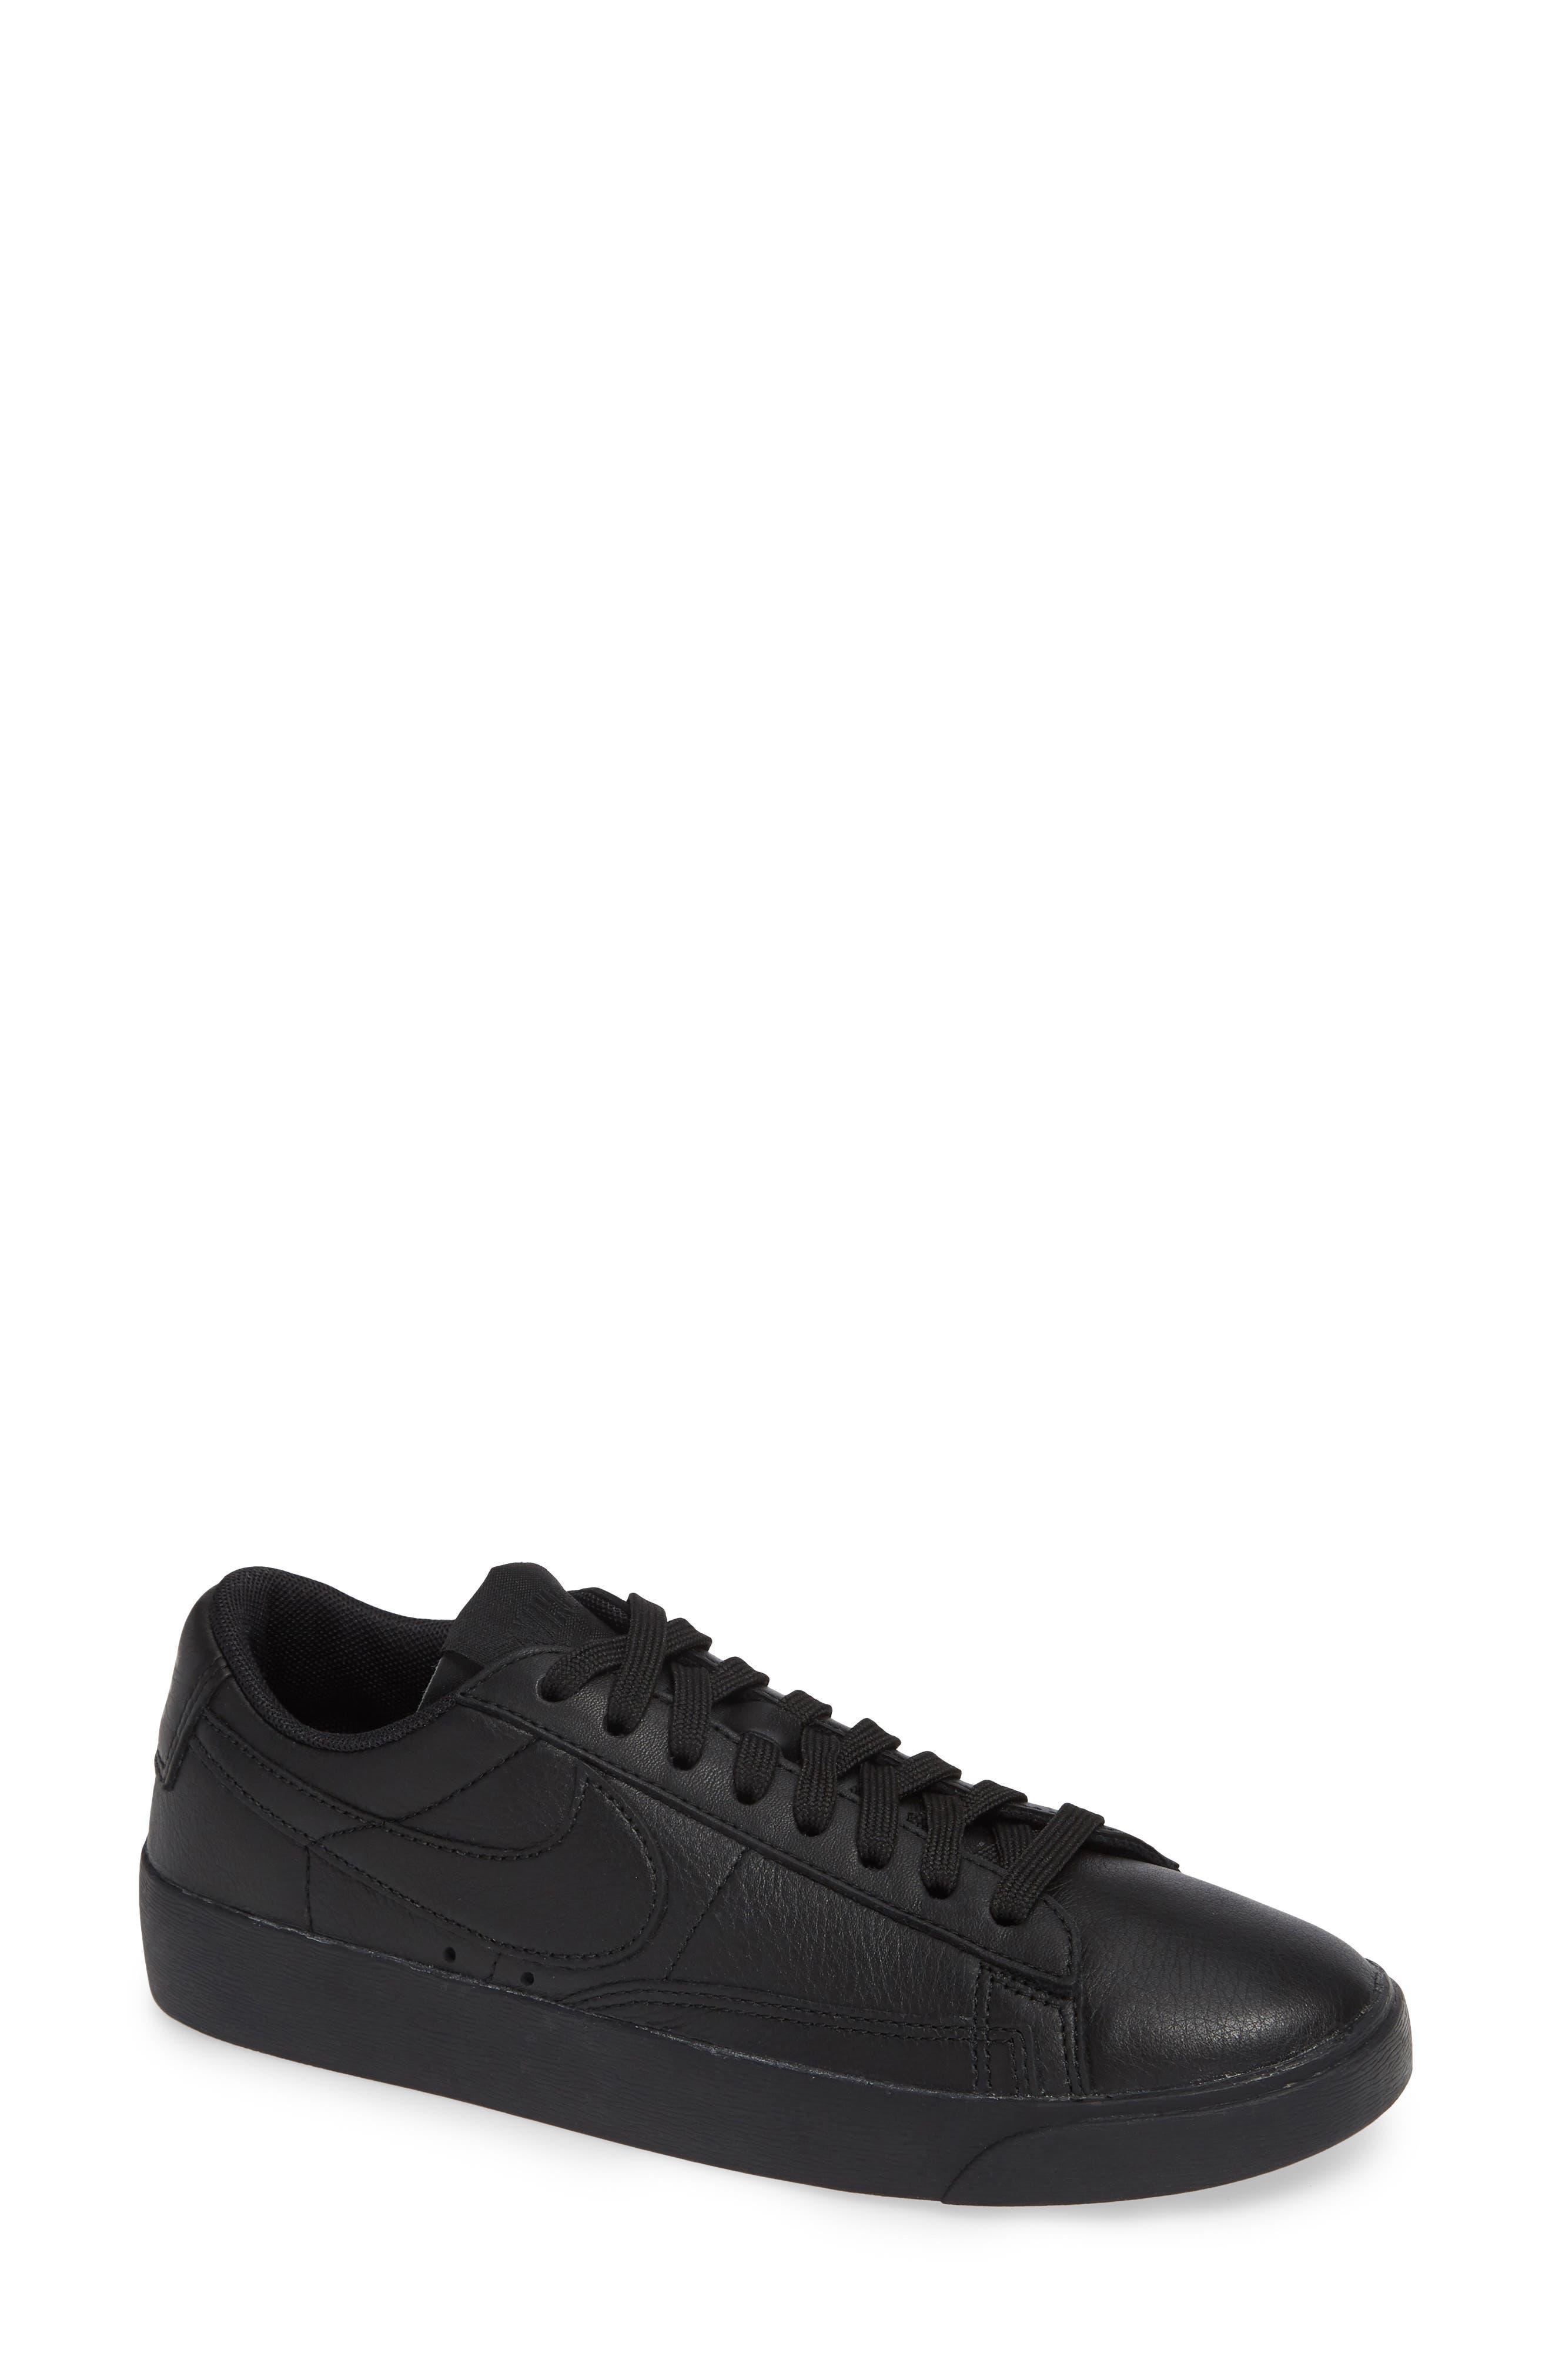 Blazer Low SE Sneaker,                             Main thumbnail 1, color,                             BLACK/ BLACK-BLACK